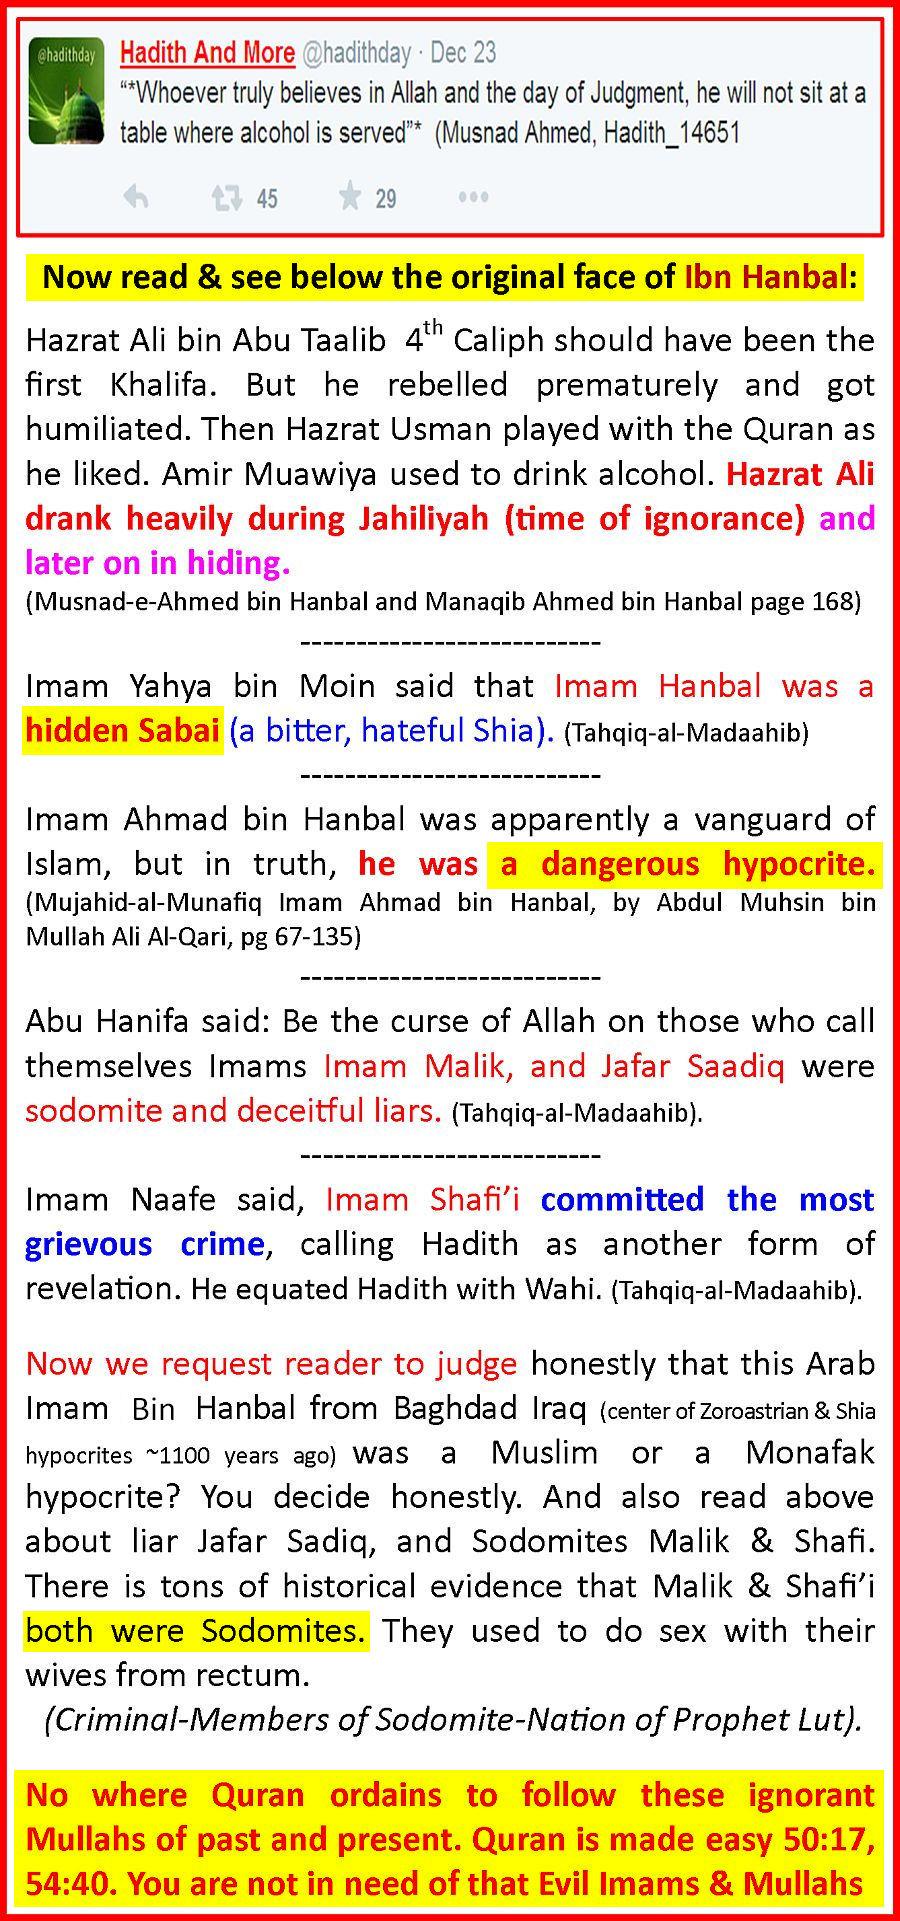 IbnHanbalAnHypocrite